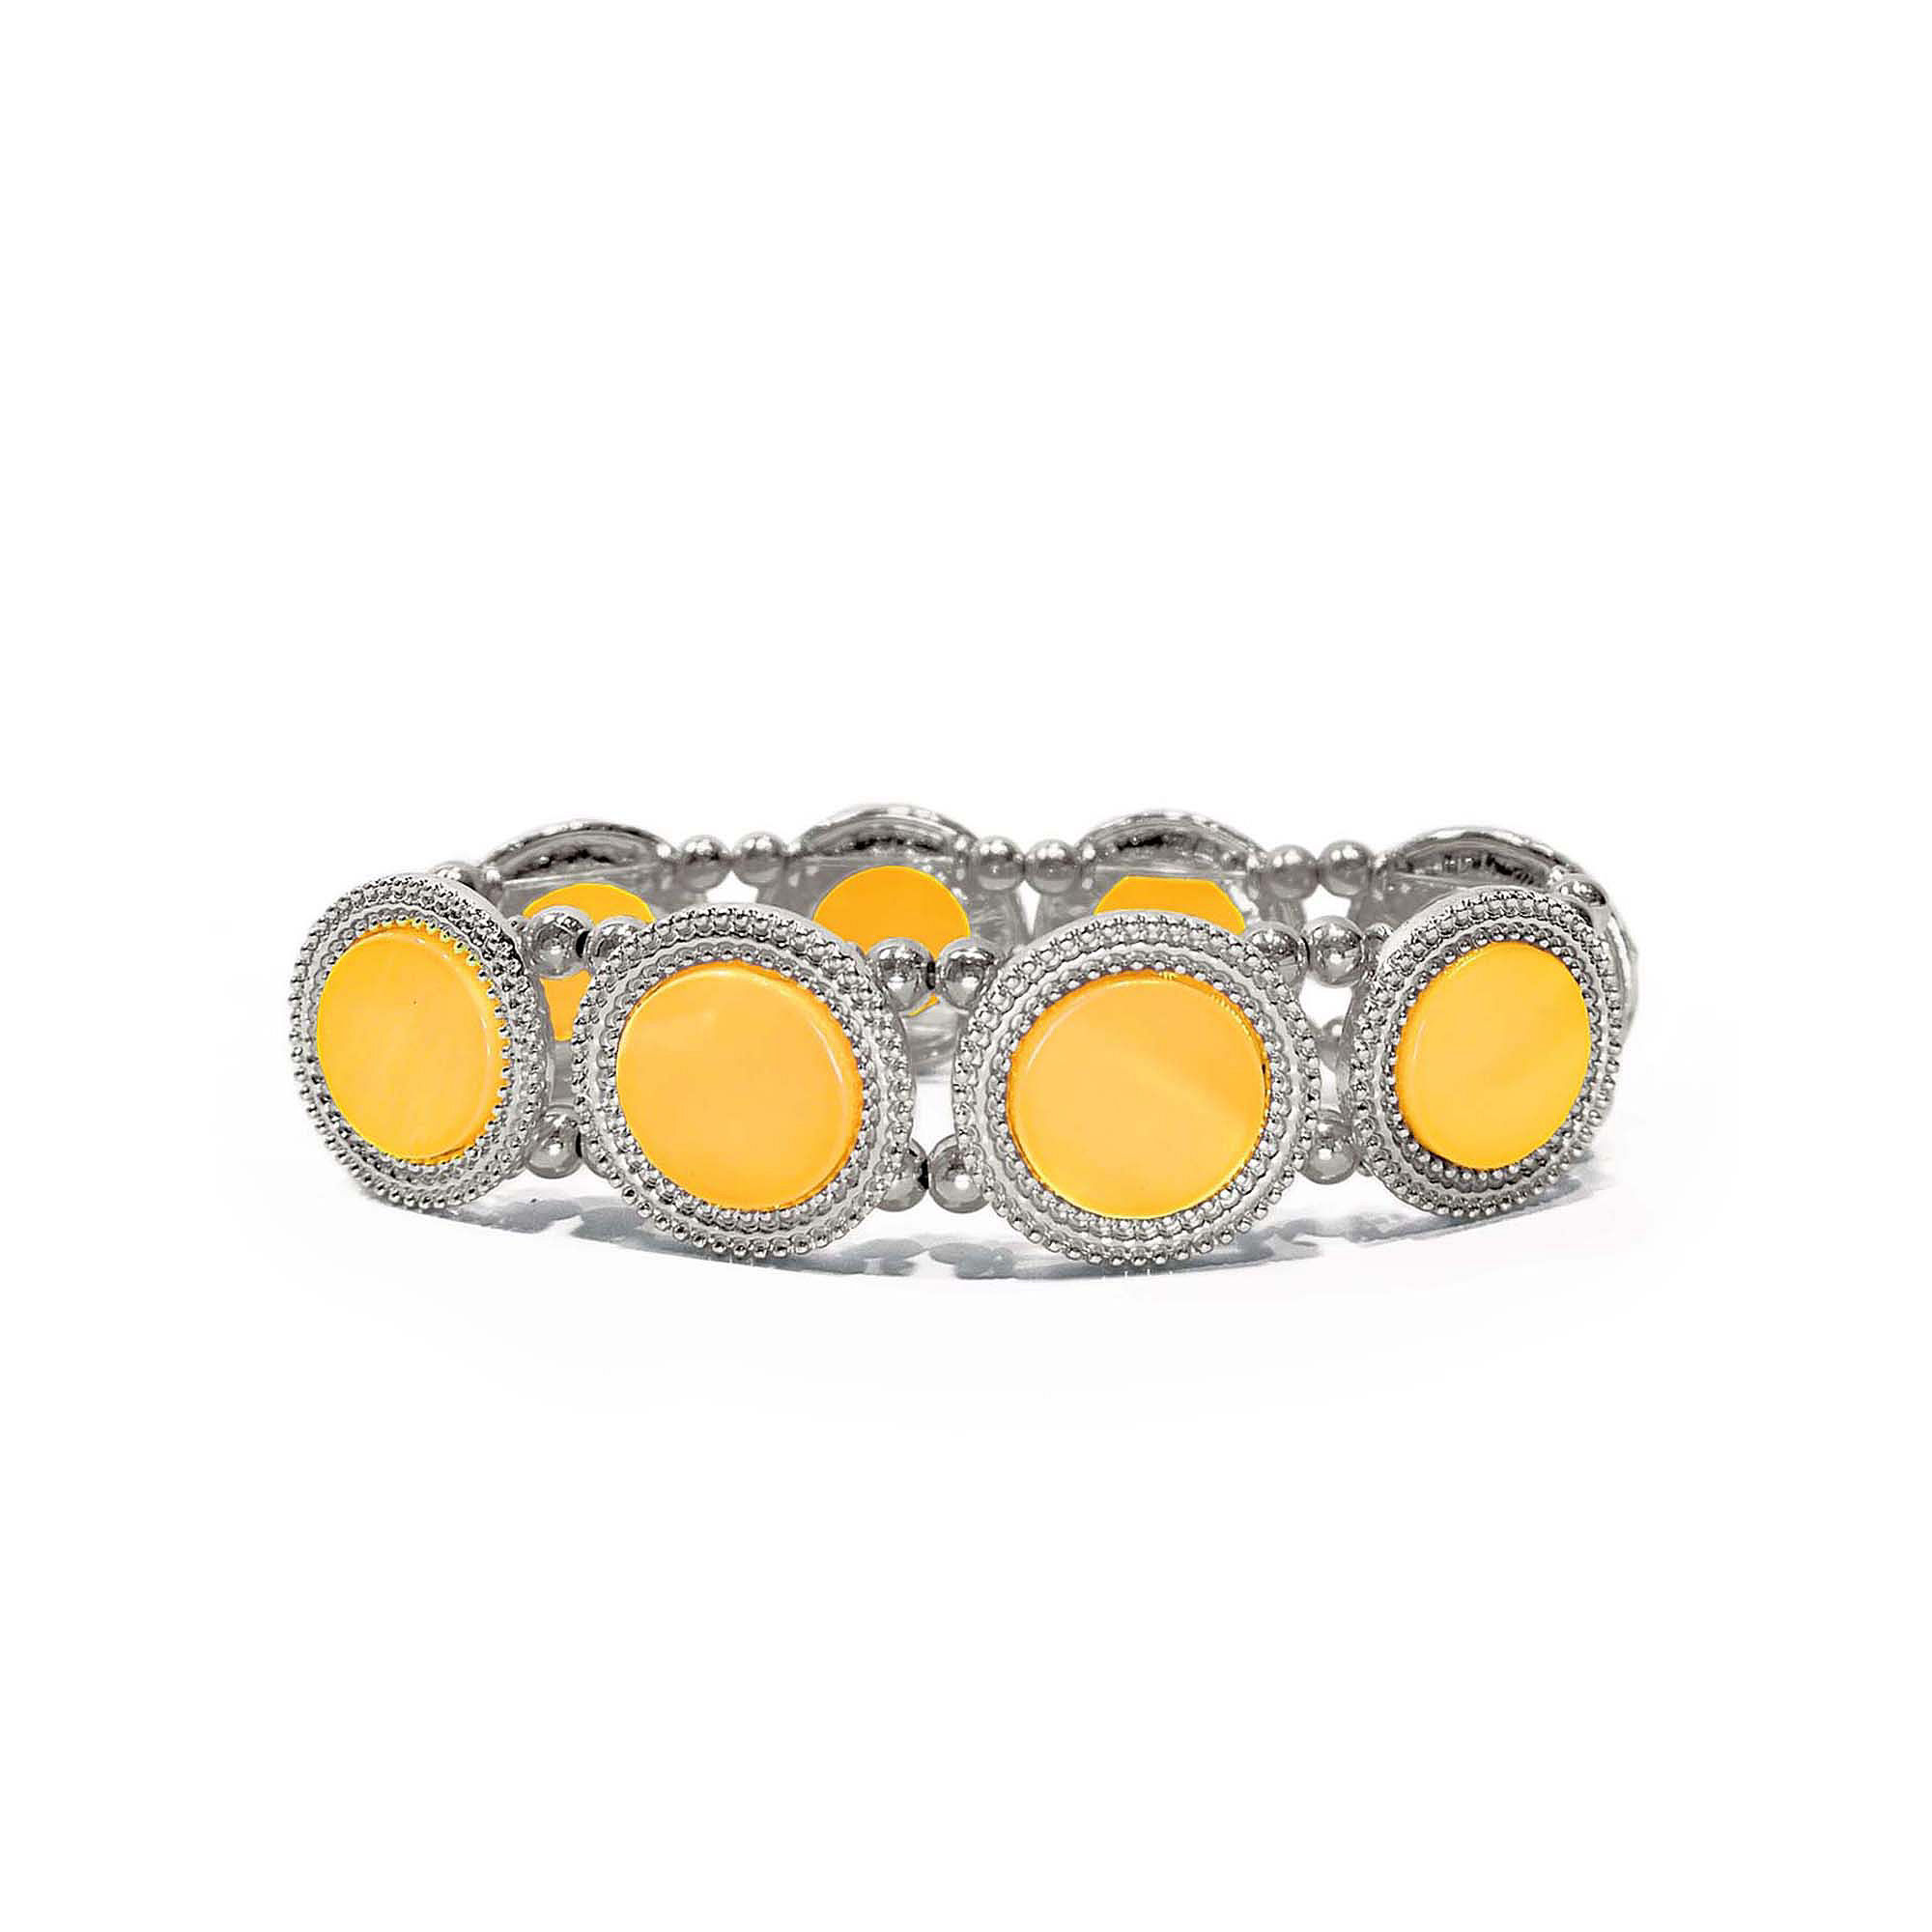 Studio by Carol Dauplaise Silver-Tone Yellow Disc Stretch Bracelet